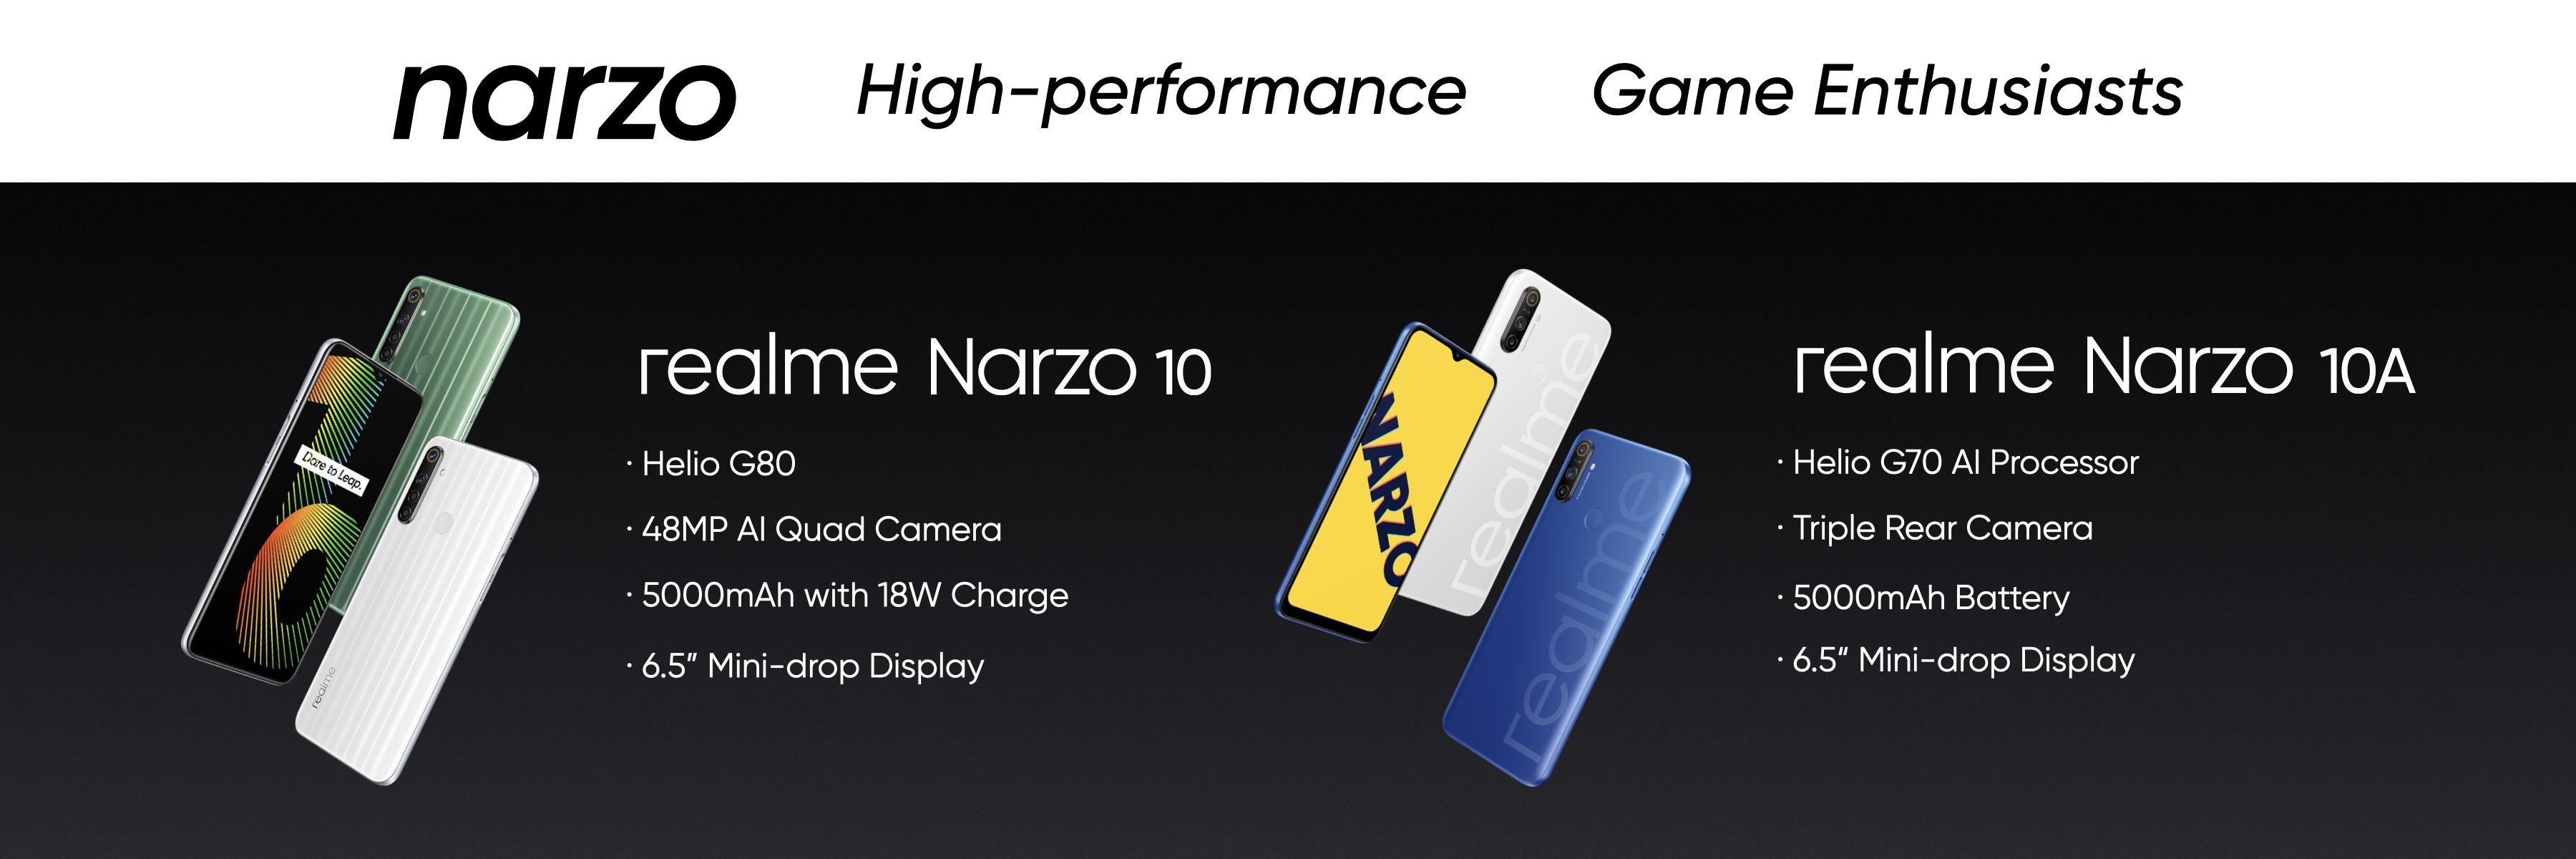 03_【4G產品線】realme Narzo系列,為遊戲玩家量身打造。